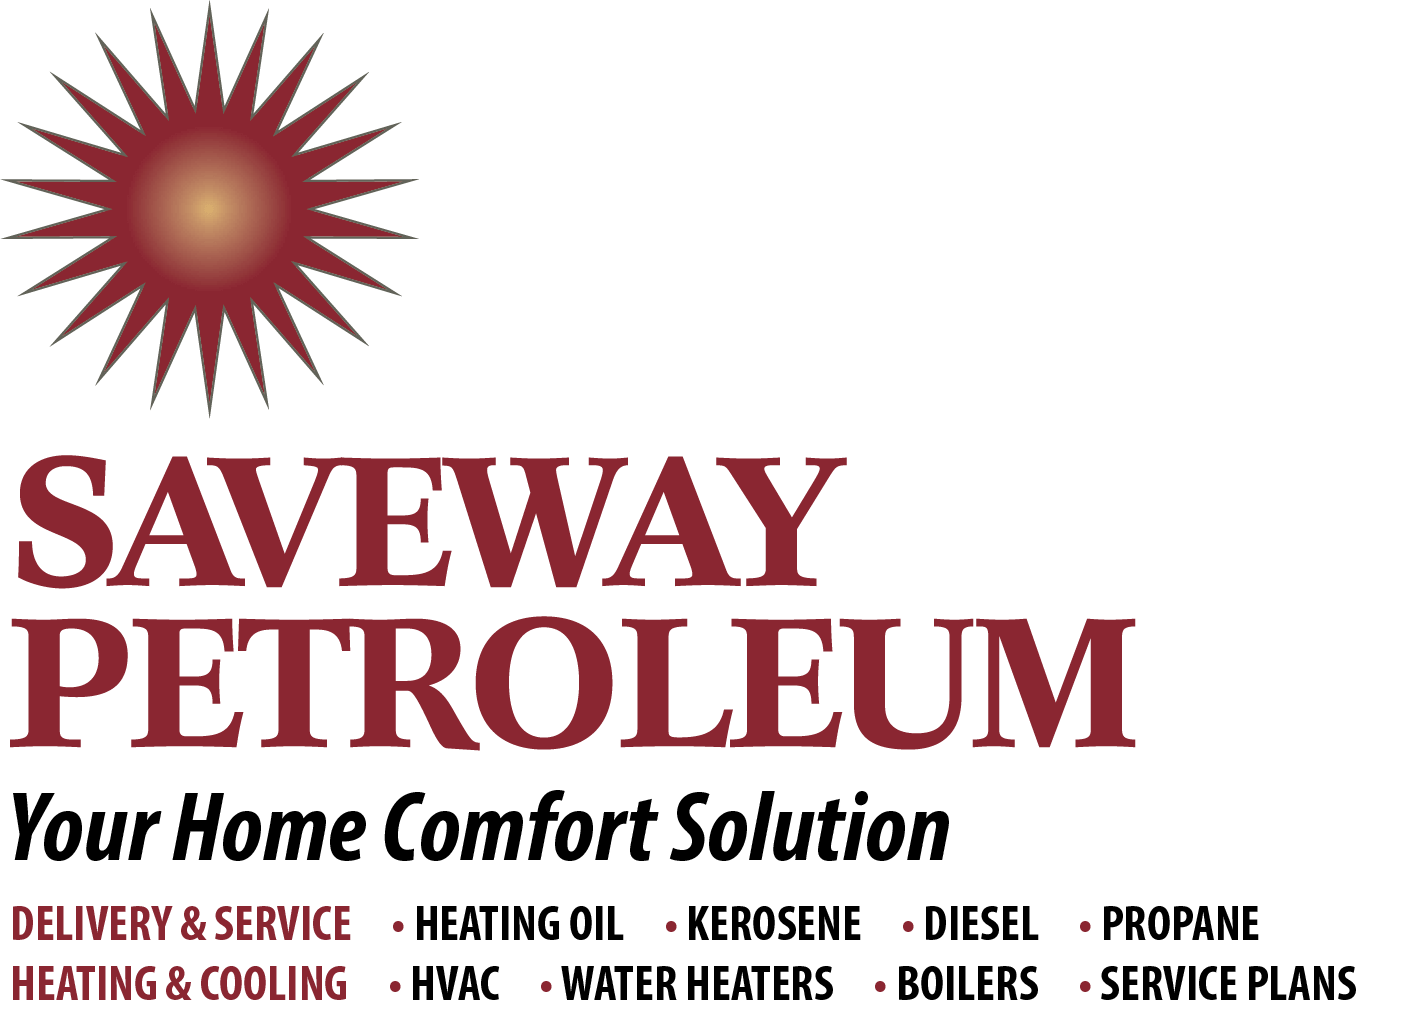 Saveway Petroleum